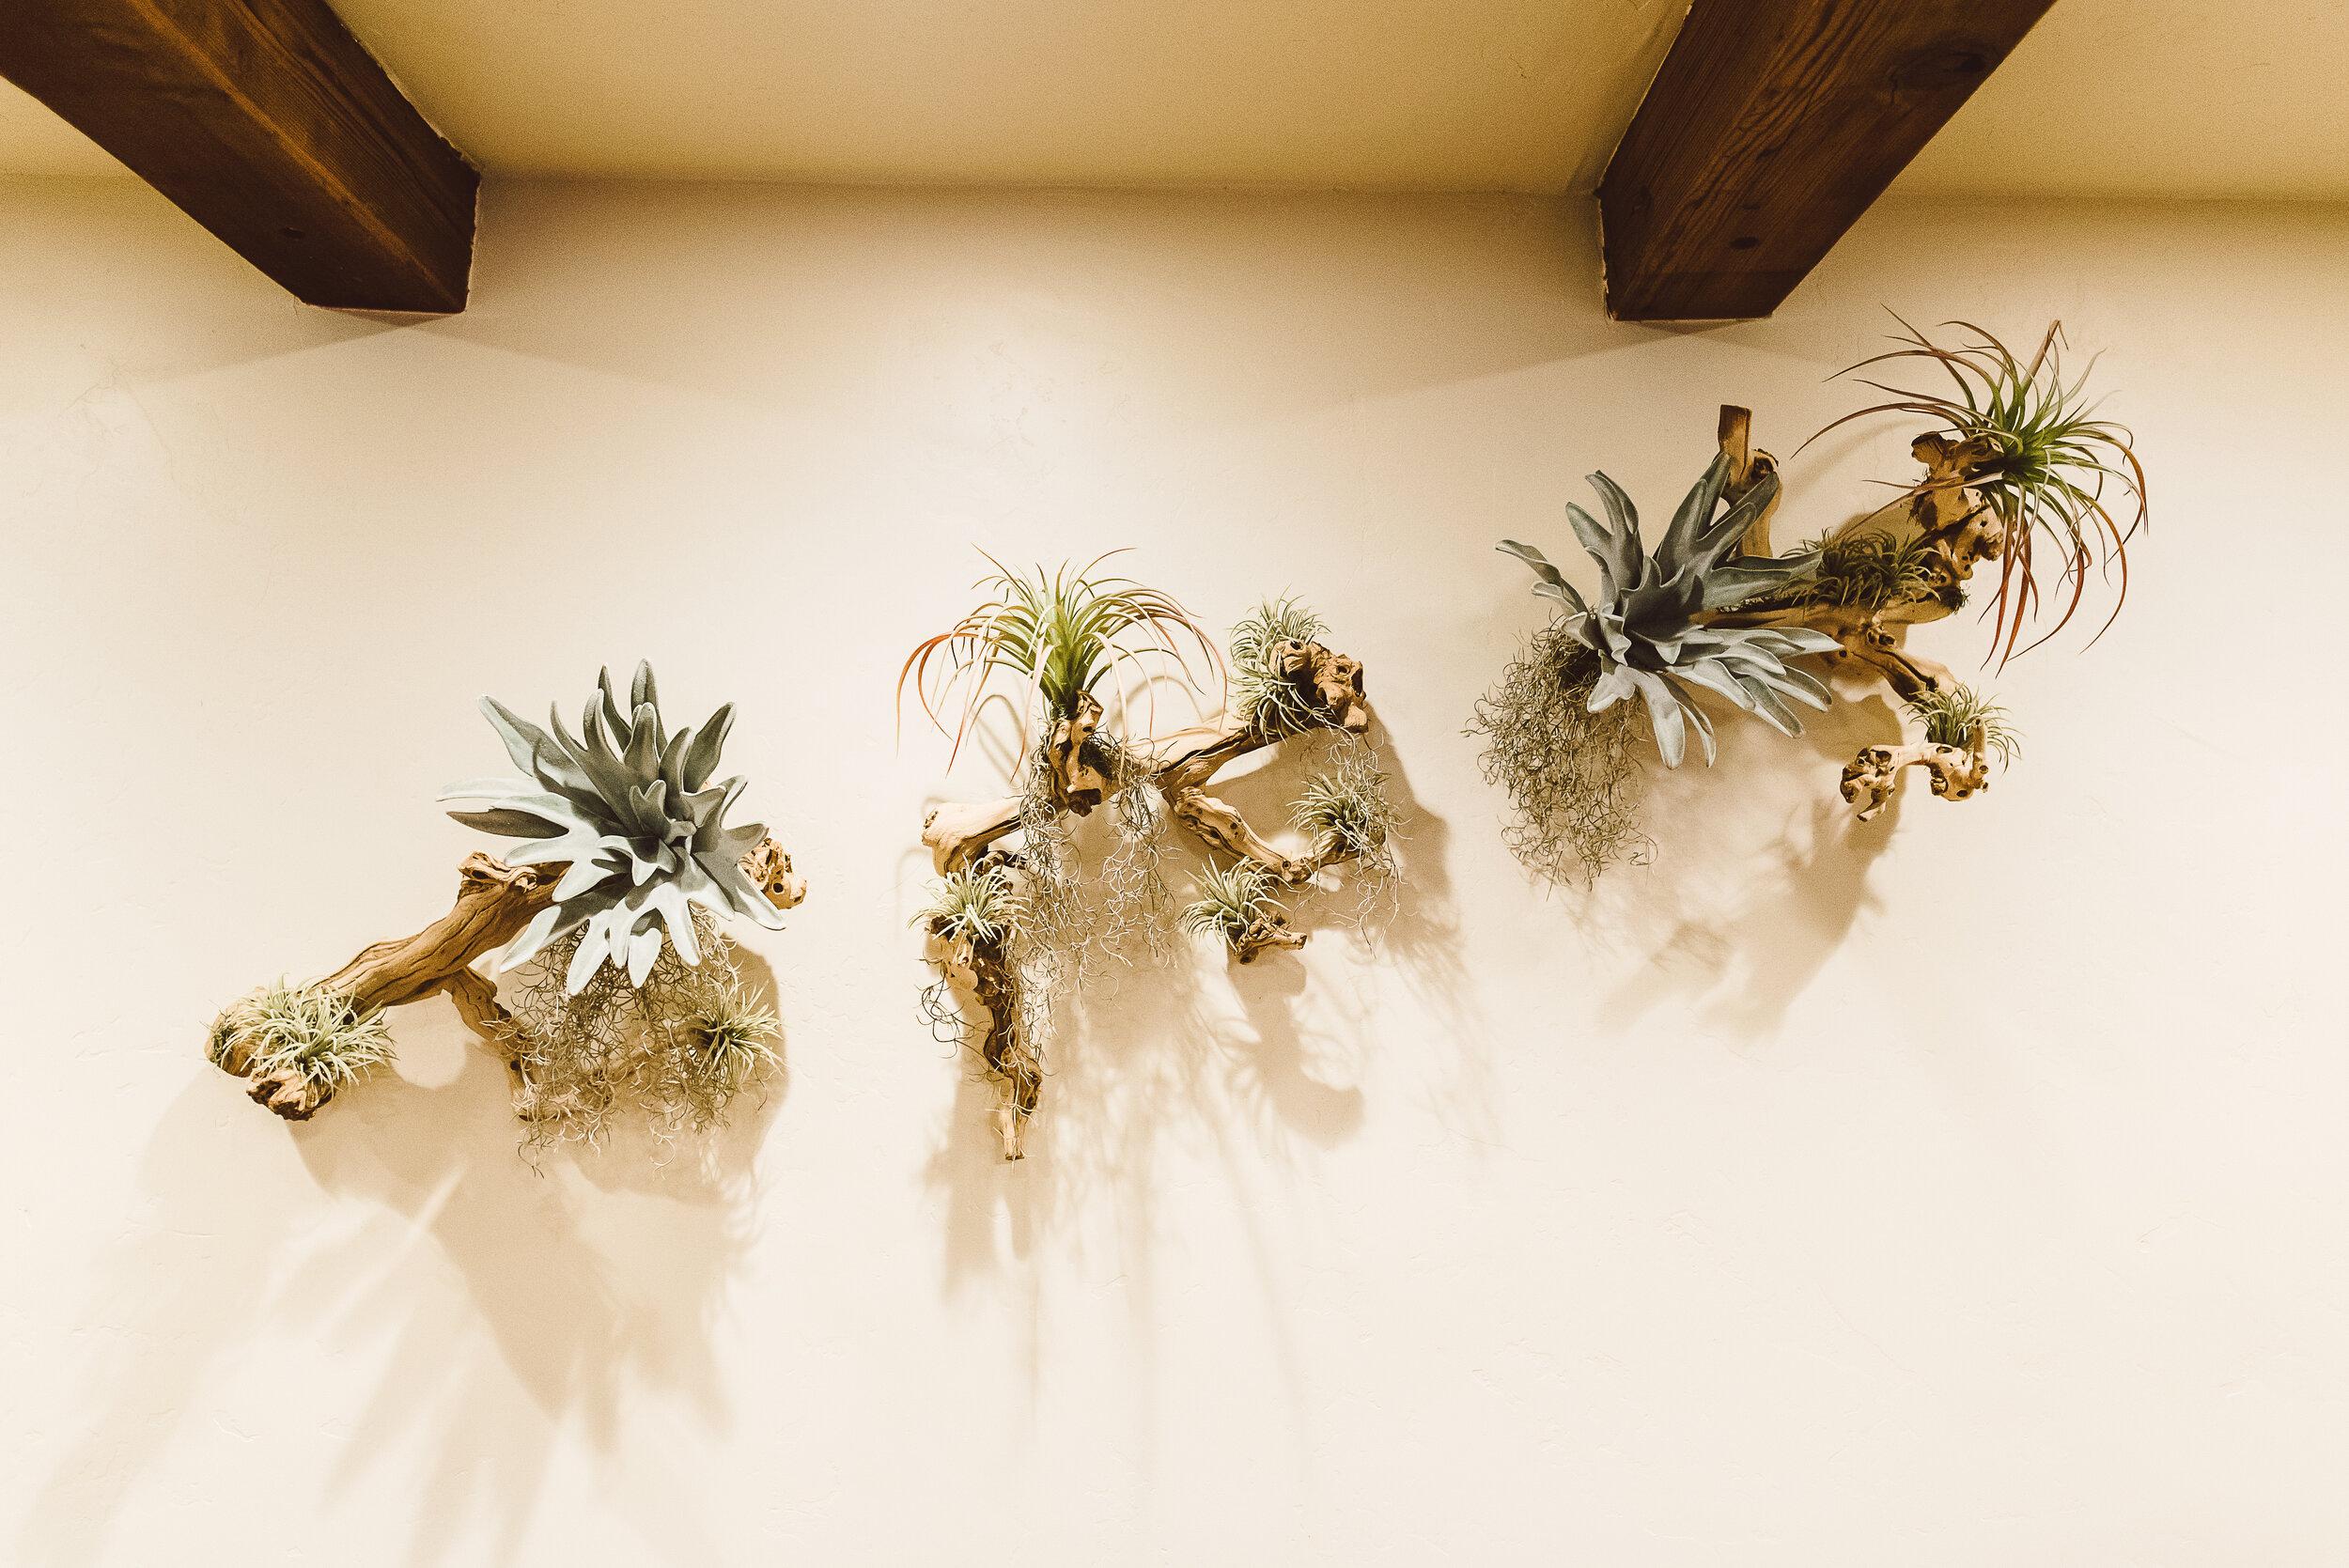 2018 Marie Monforte_Succulents at Cocina -6.jpg